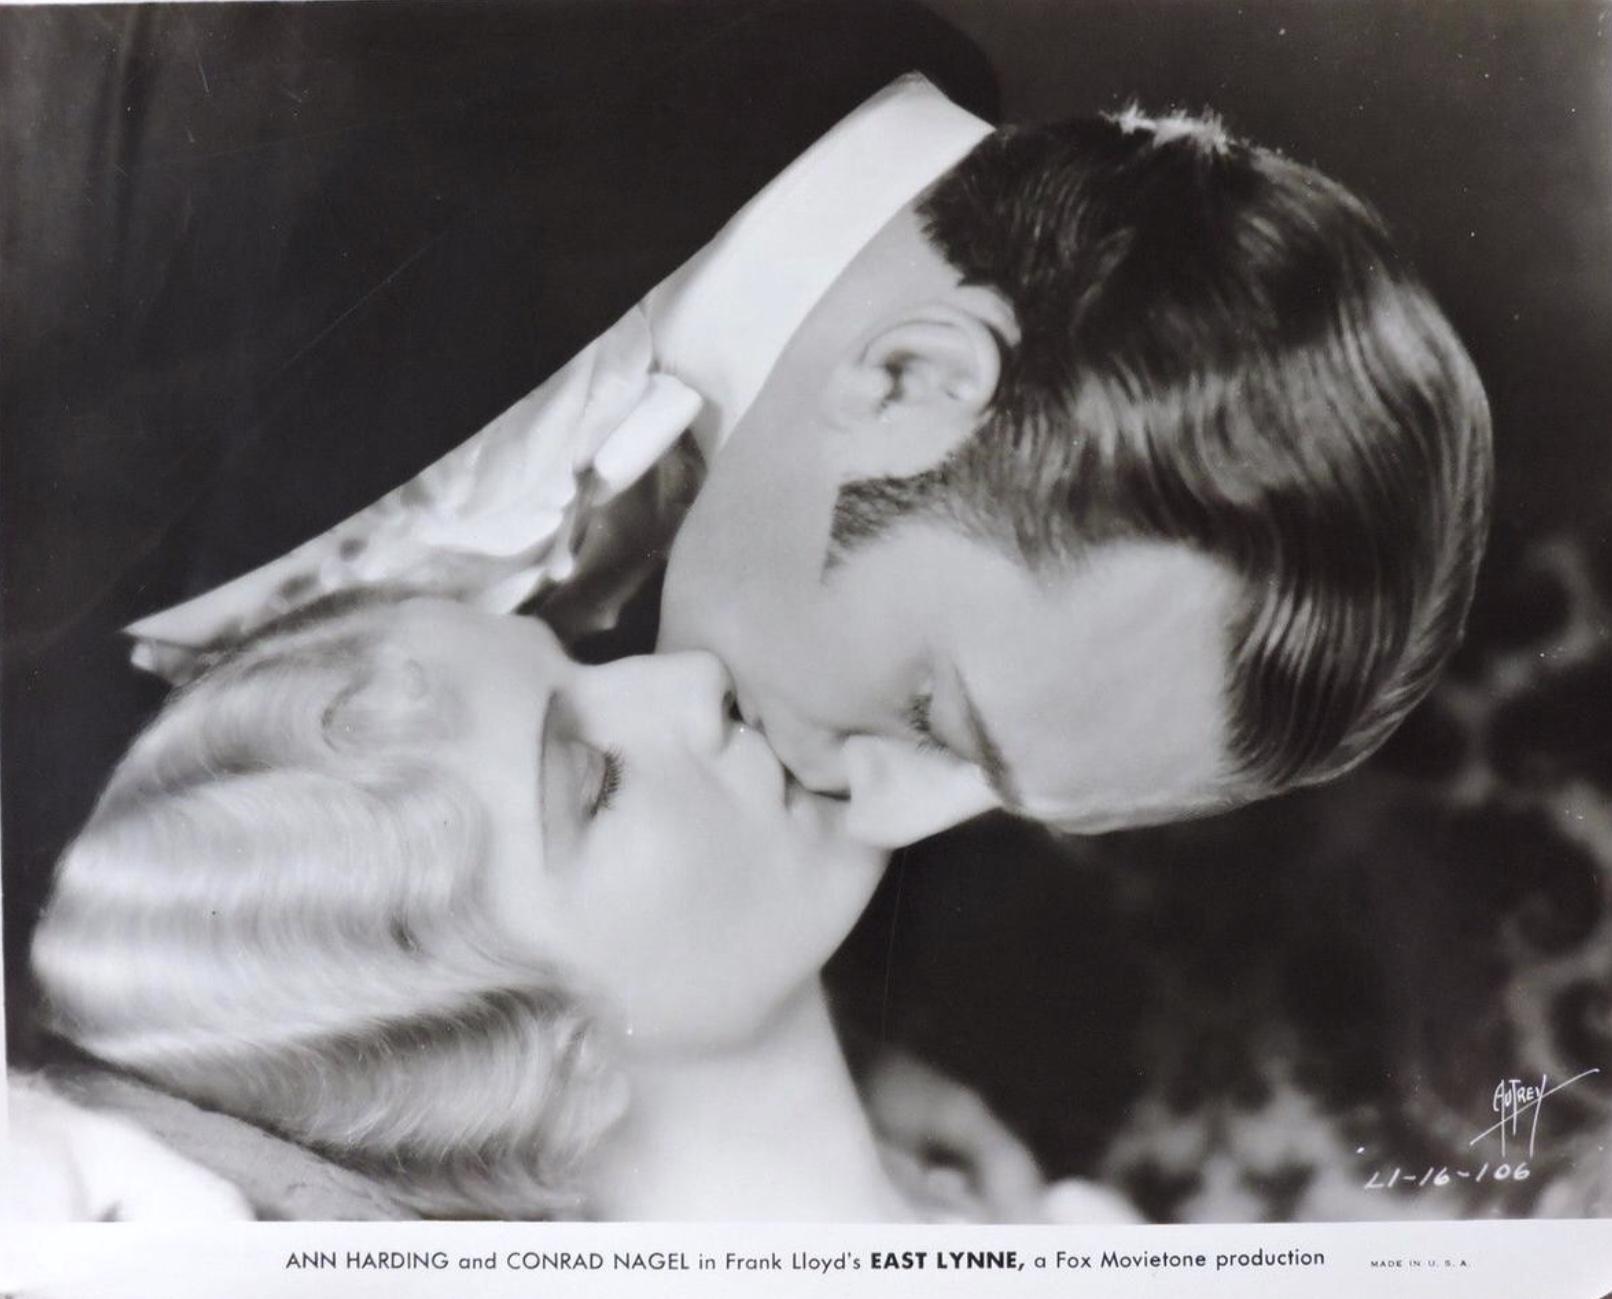 Ann Harding and Conrad Nagel in East Lynne (1931)